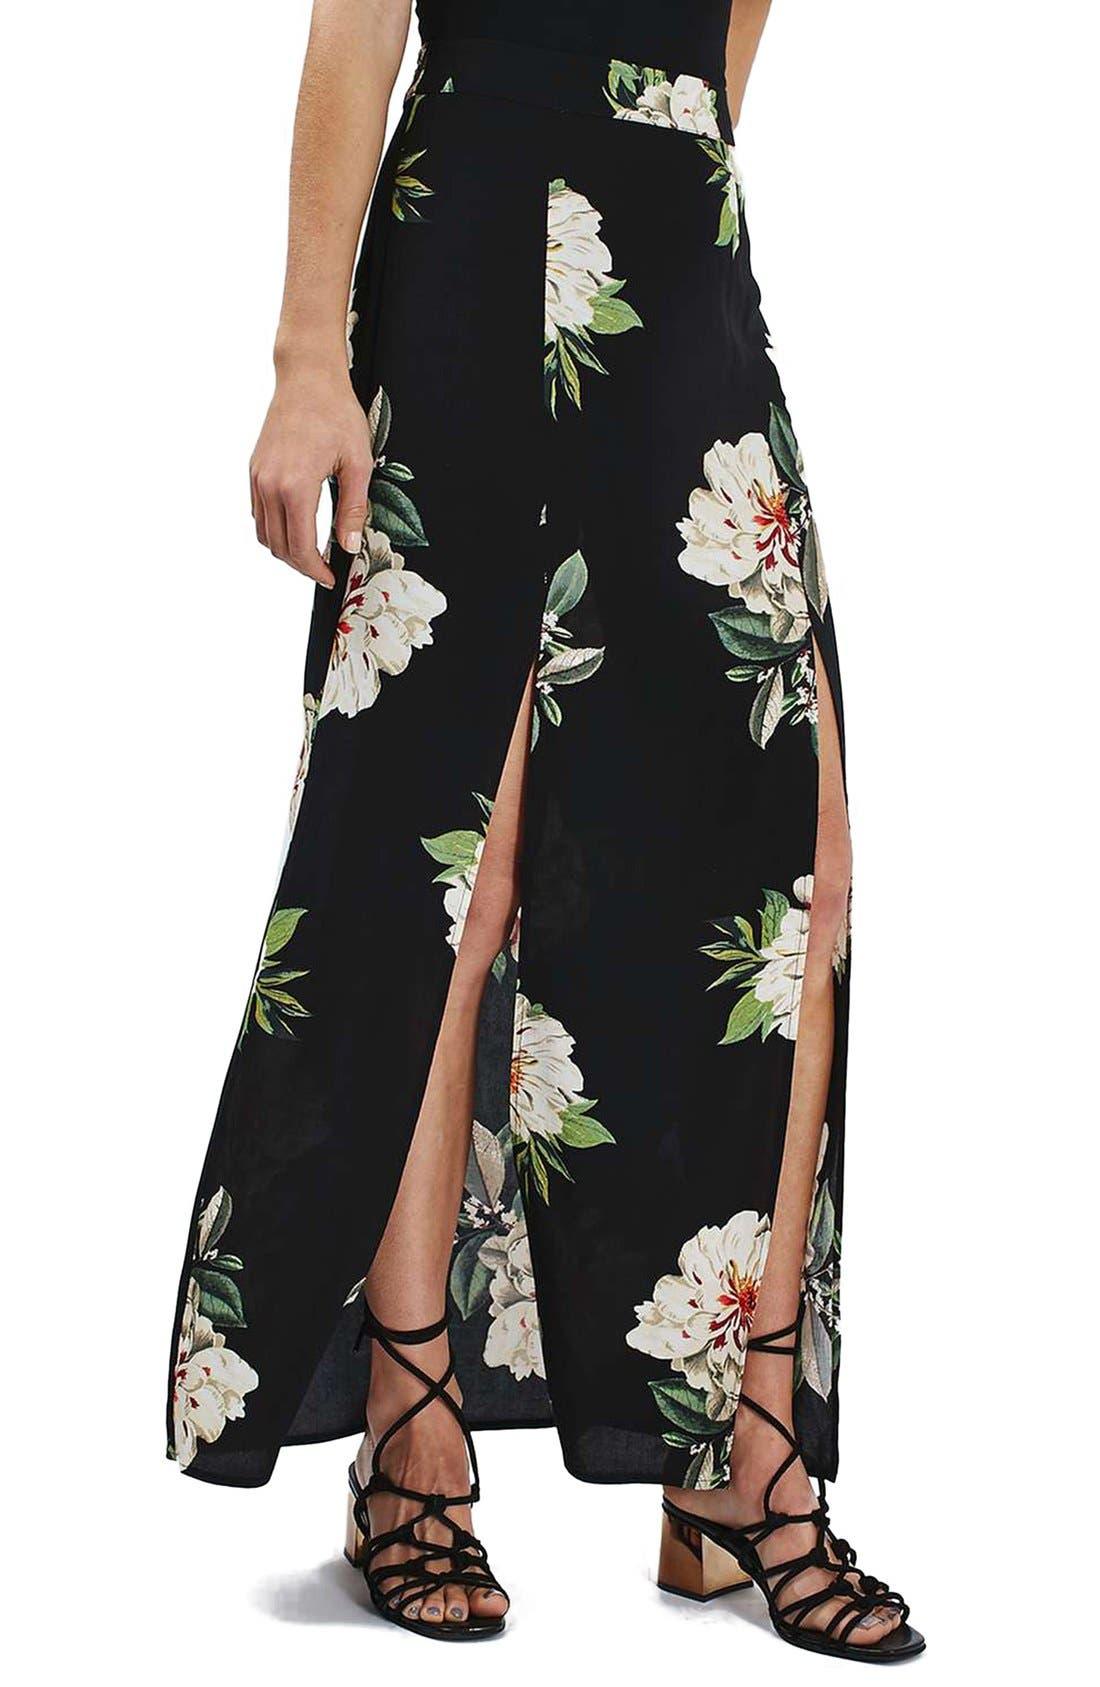 Alternate Image 1 Selected - Topshop Floral Print Maxi Skirt